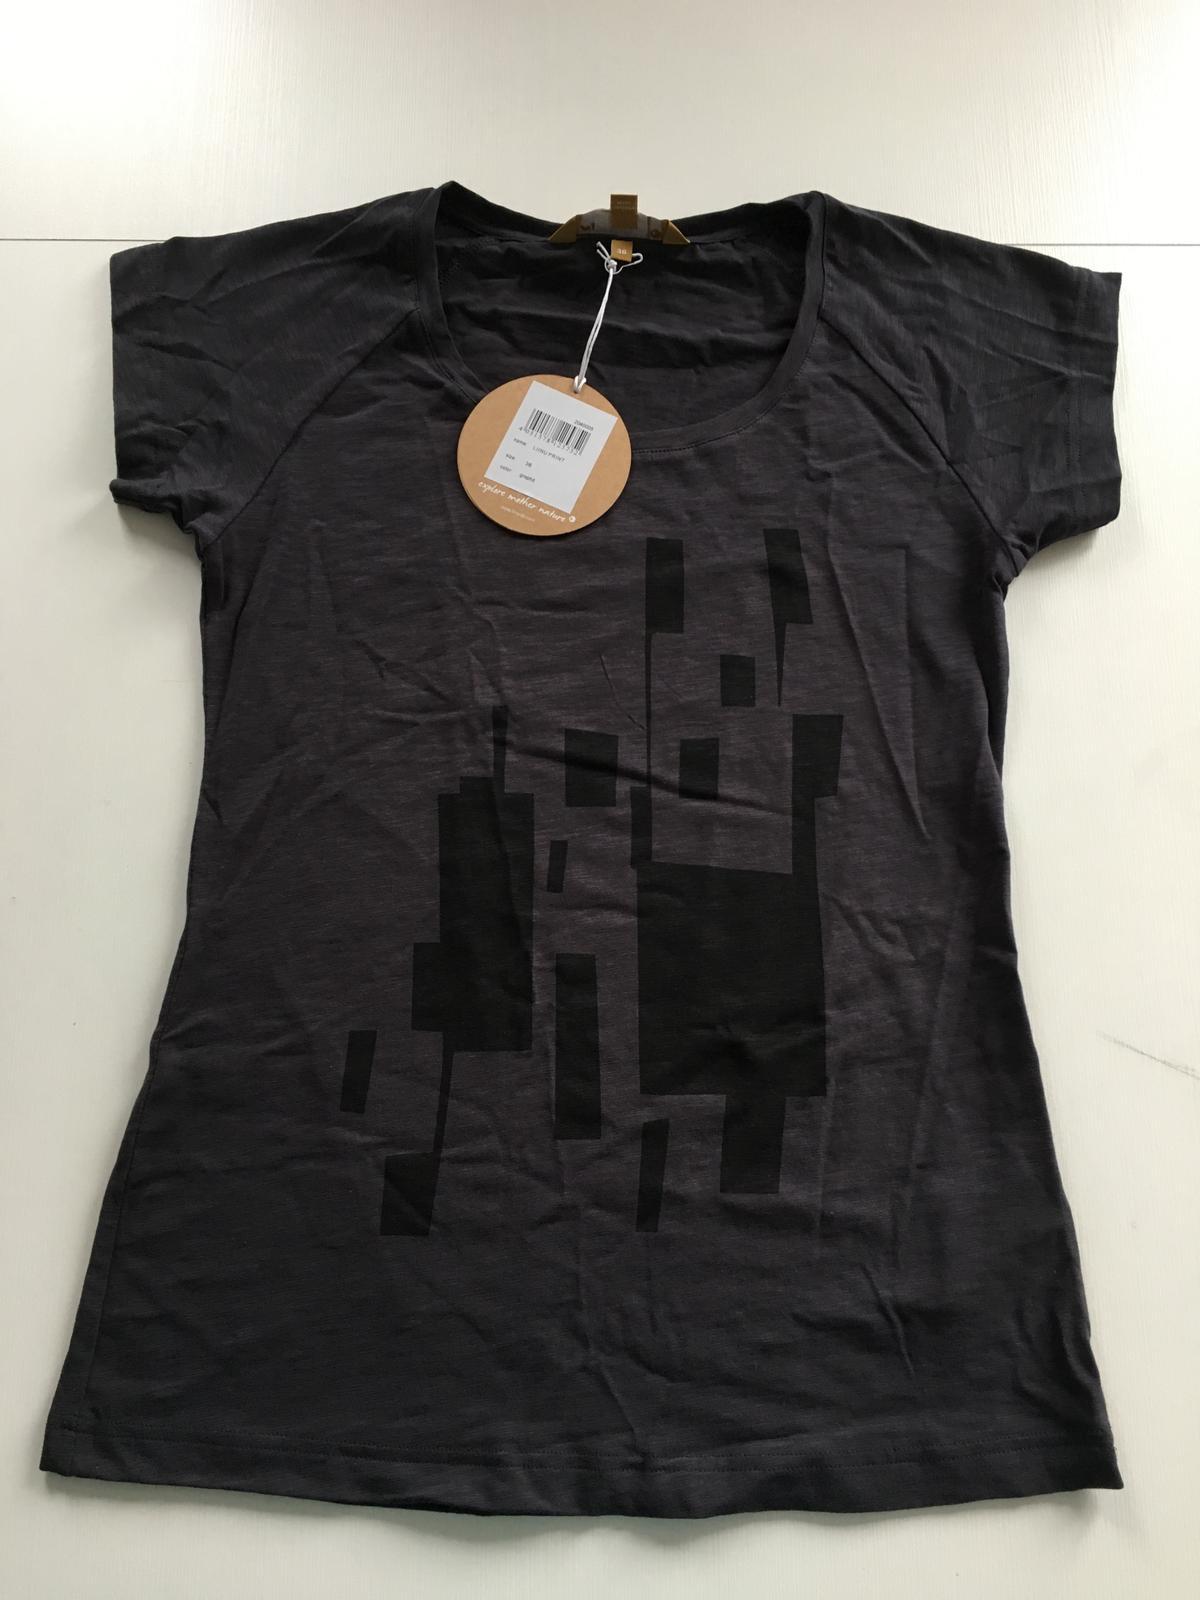 5f68804efe16 Luxusné dámske tričko zn. finside